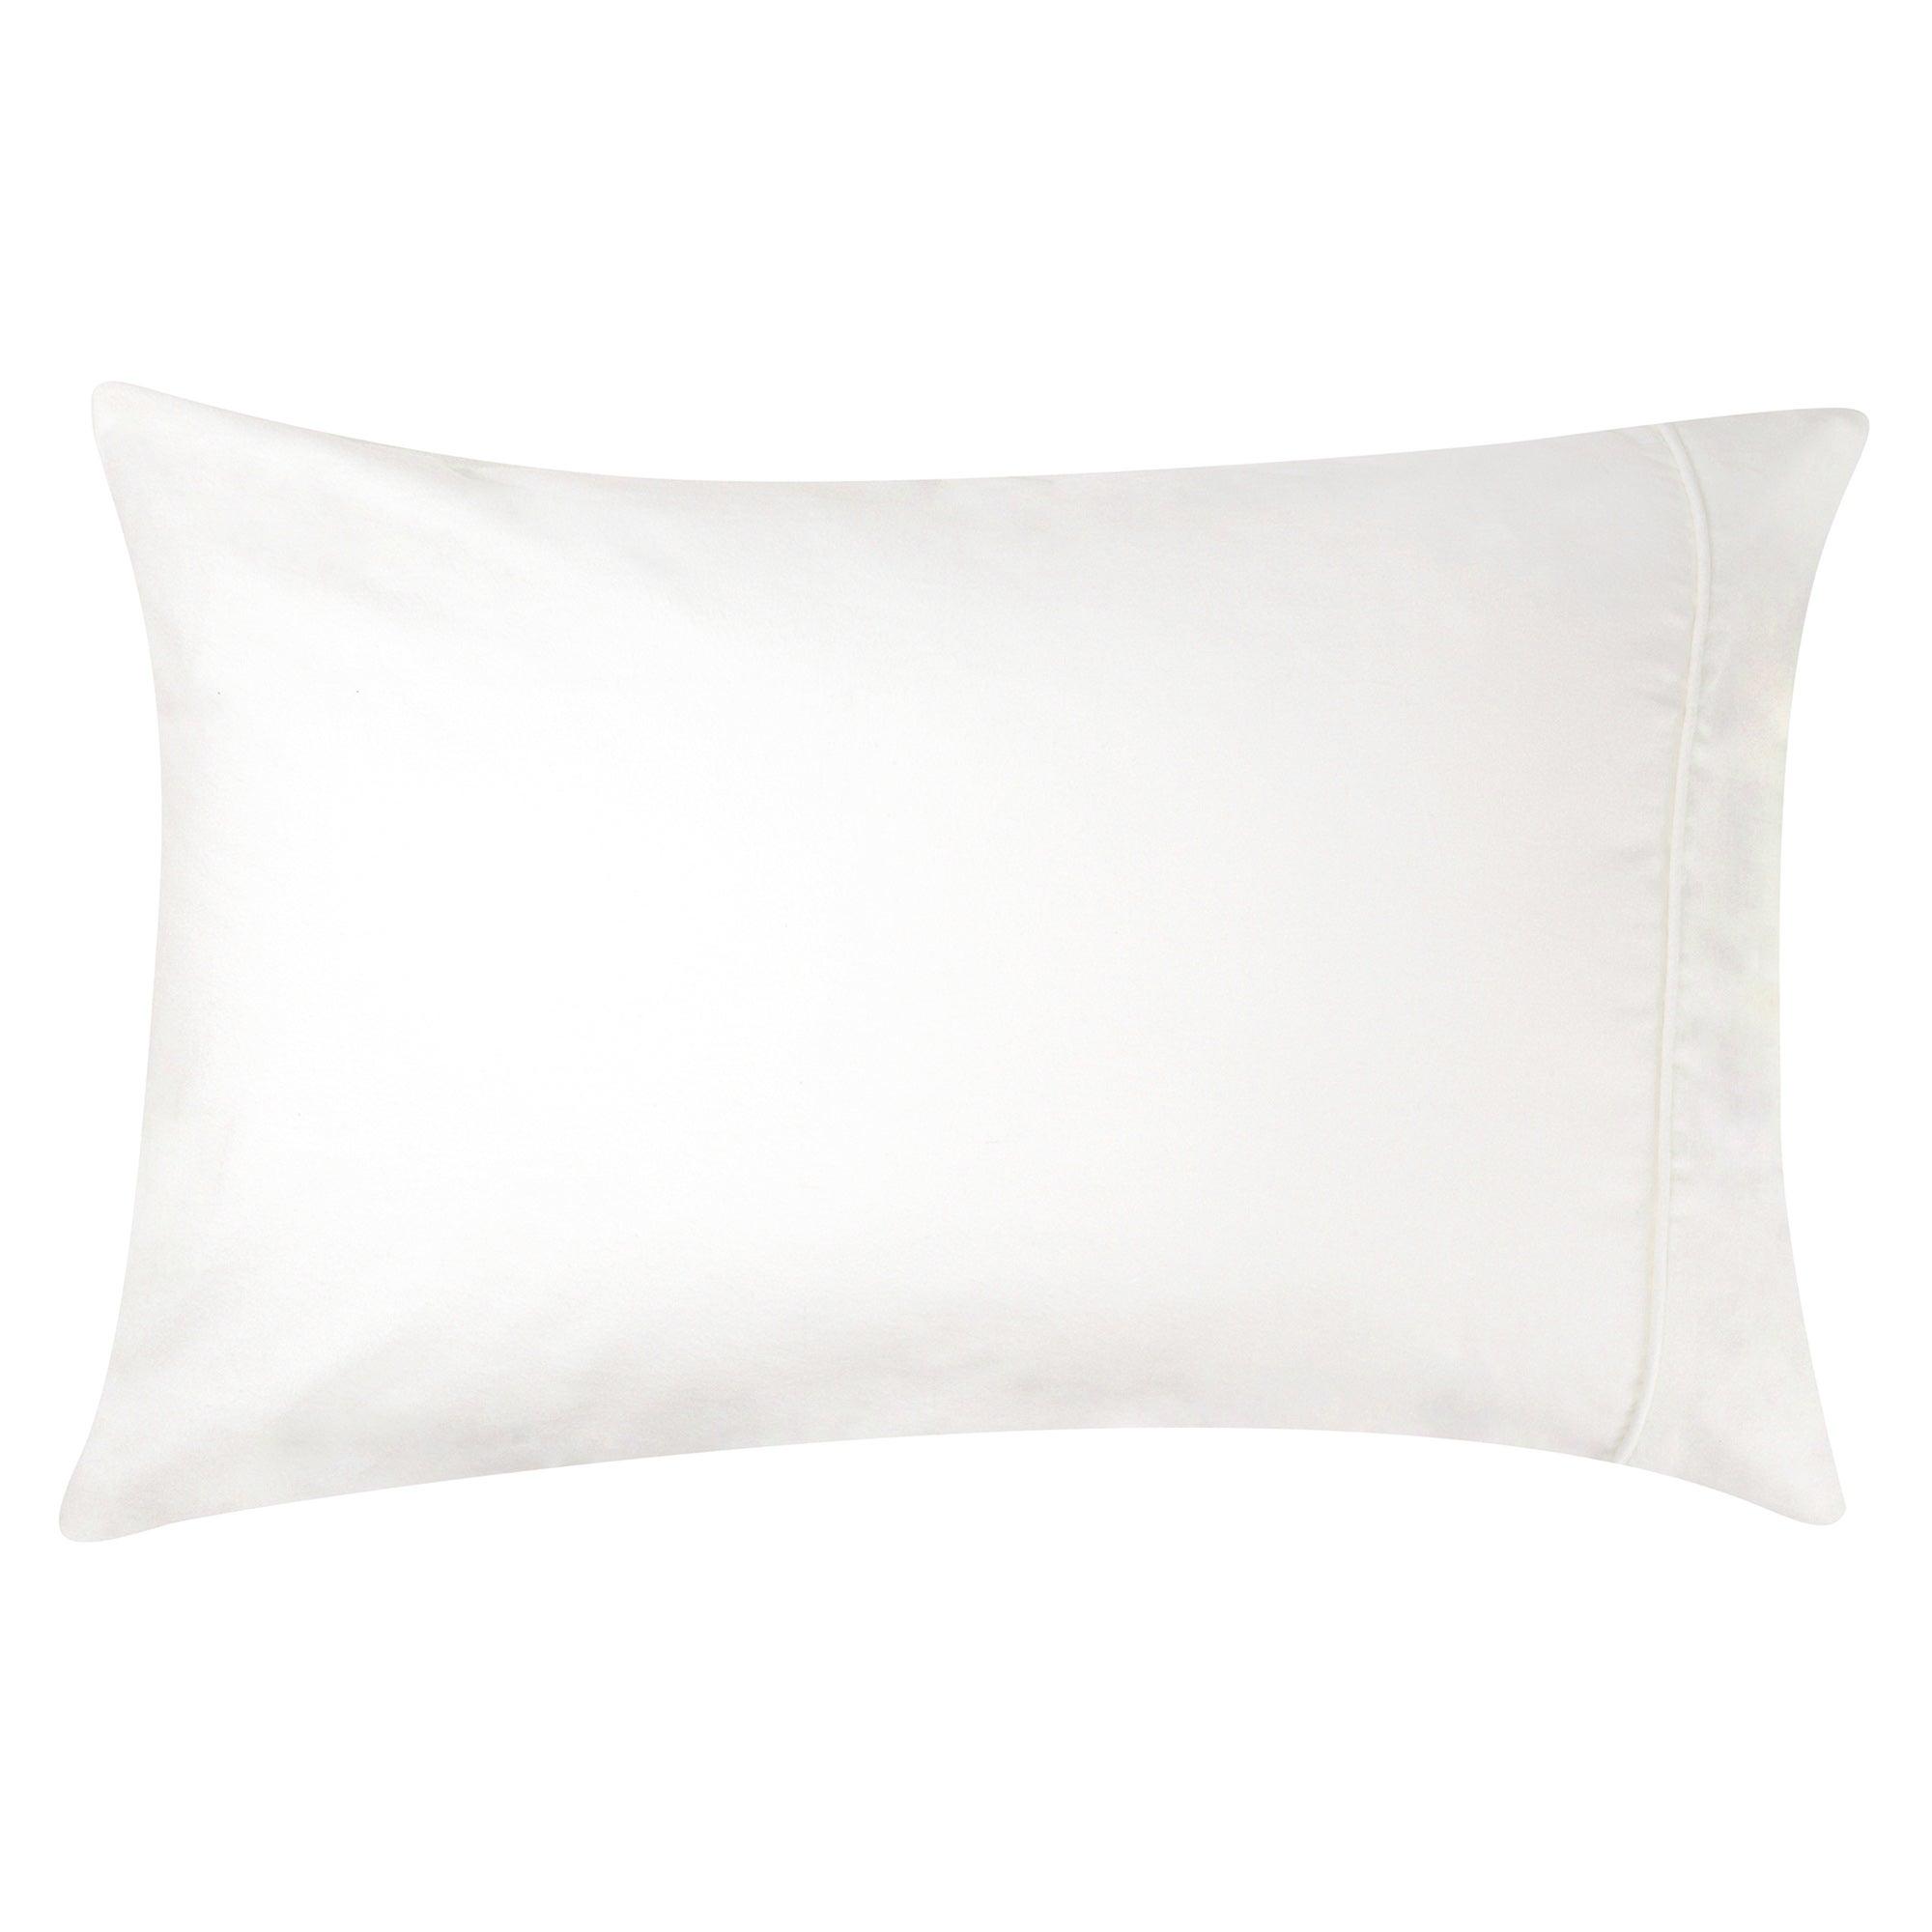 Dorma Cream Velvety Soft Housewife Pillowcase